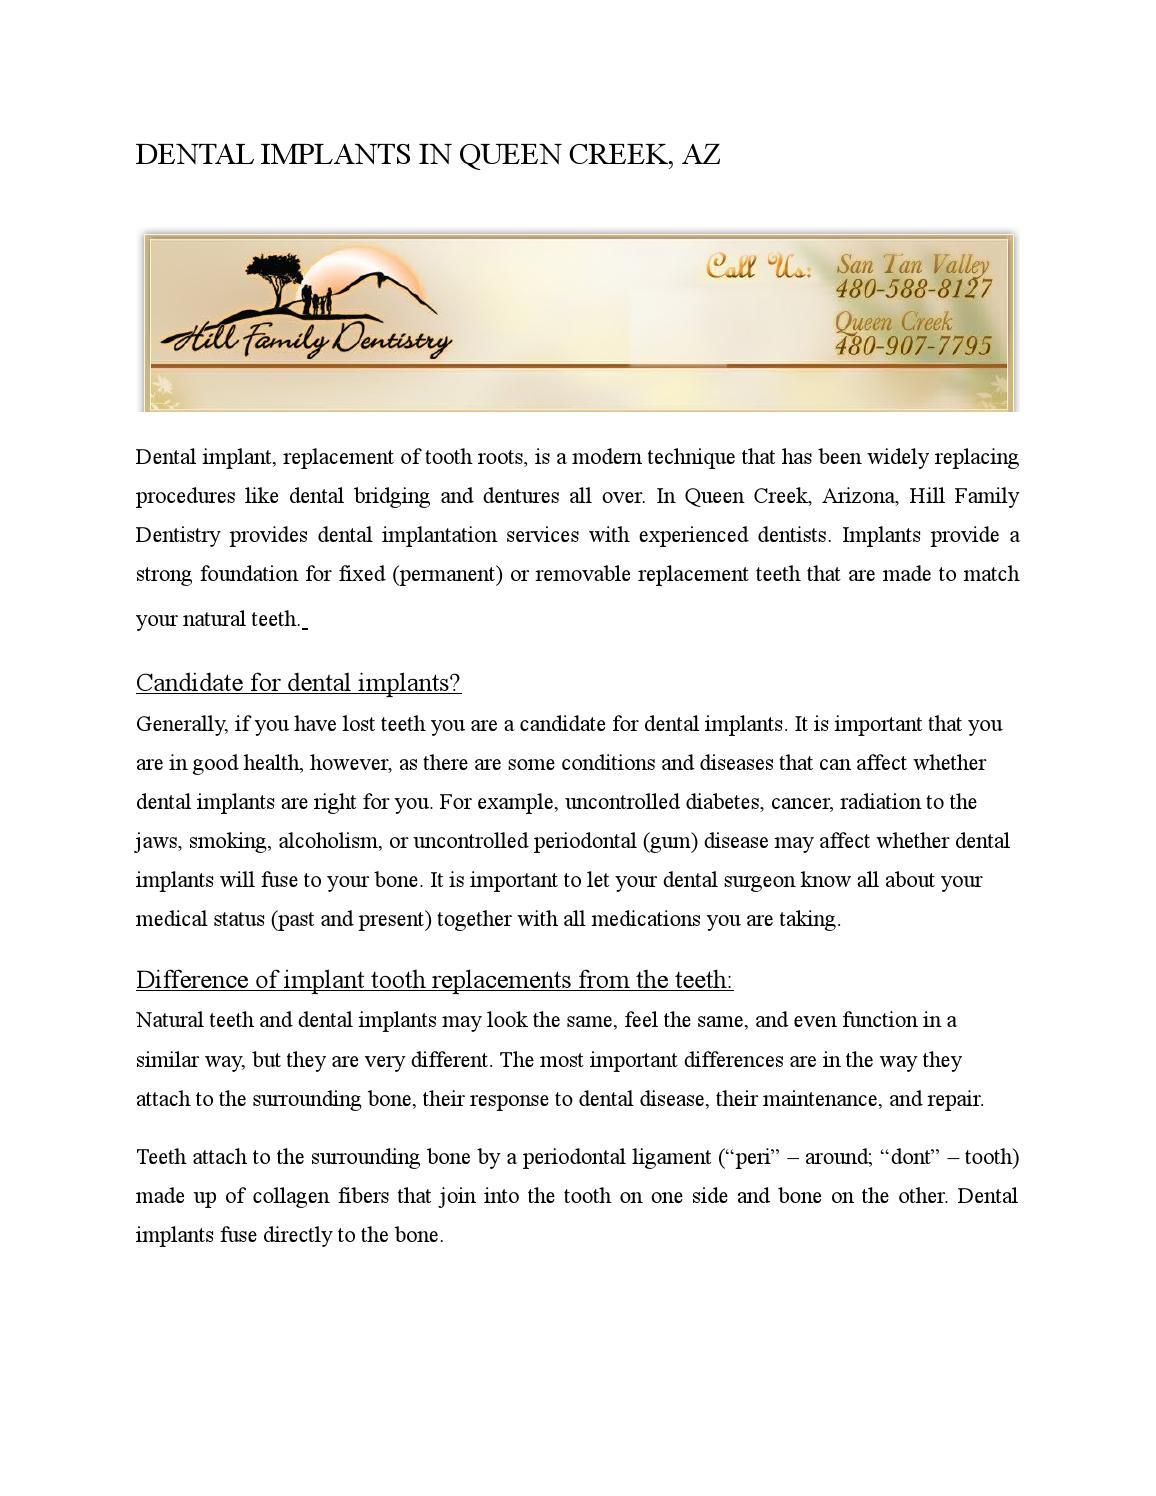 Dental Implants In Queen Creek Az Document Sharing Content 25 05 16